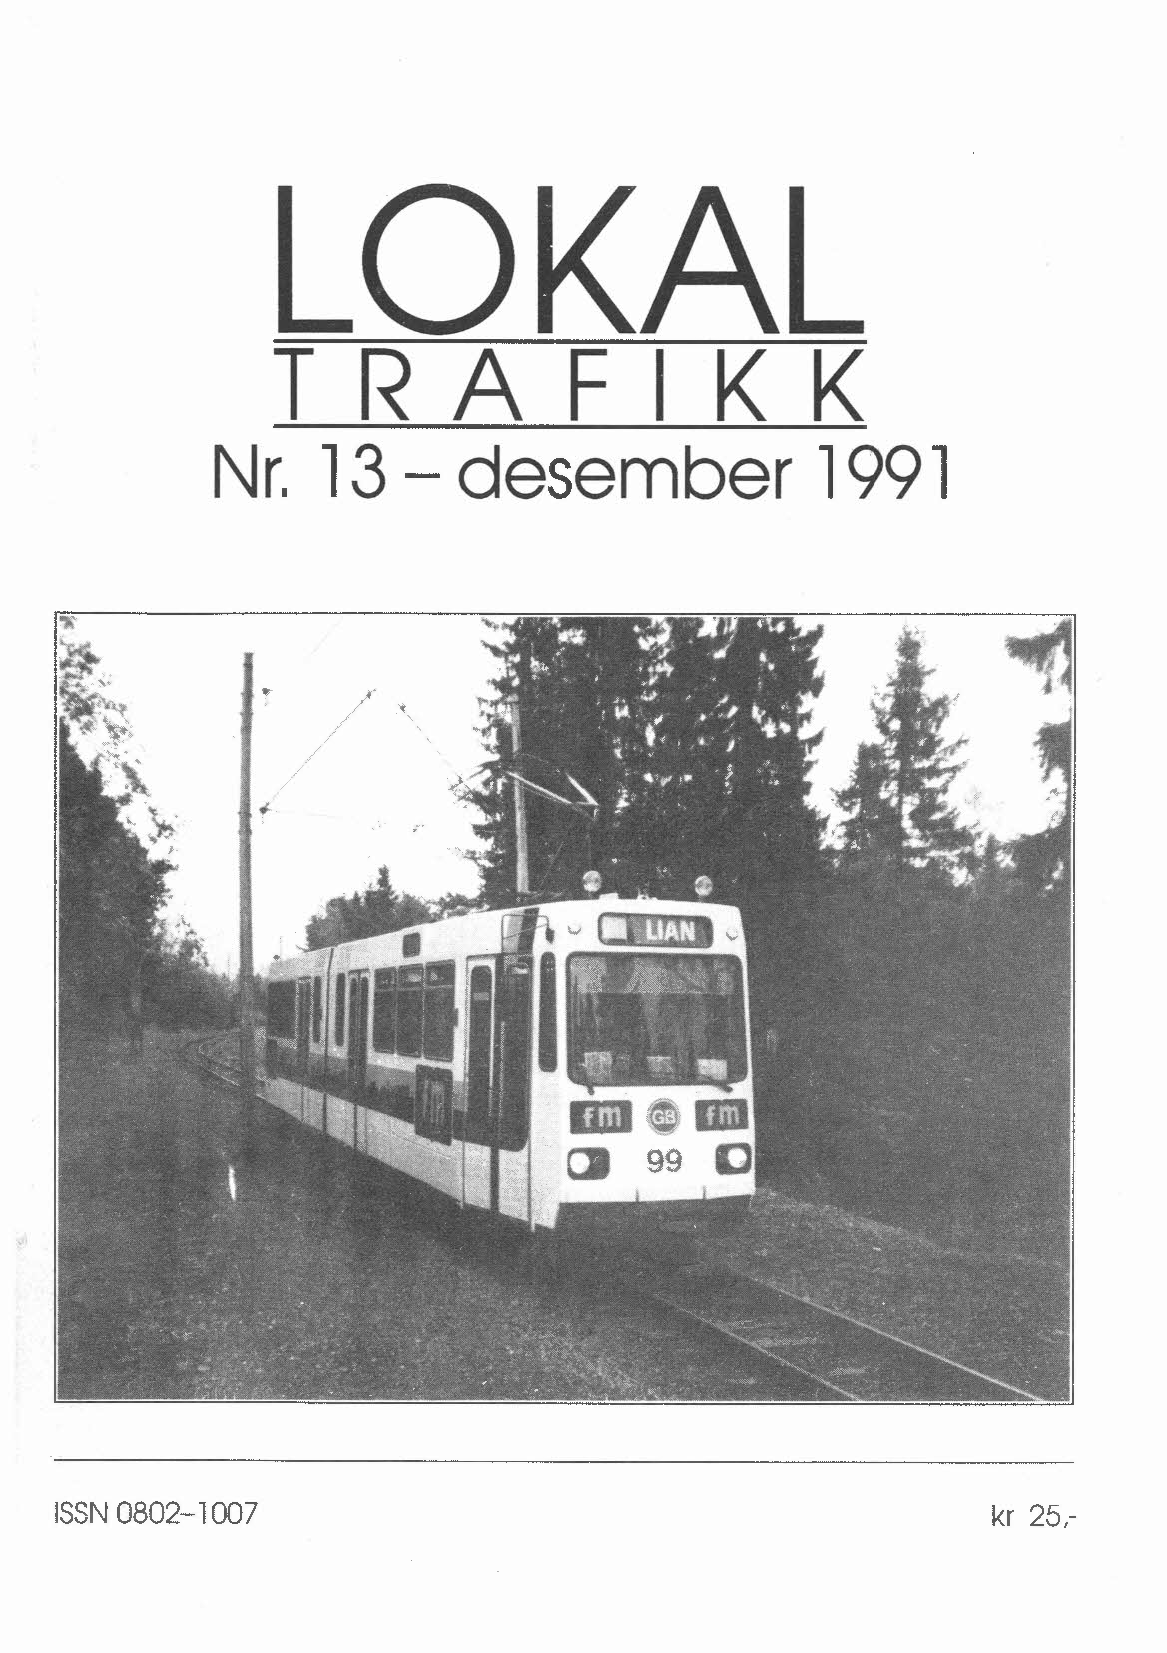 Lokaltrafikk #013